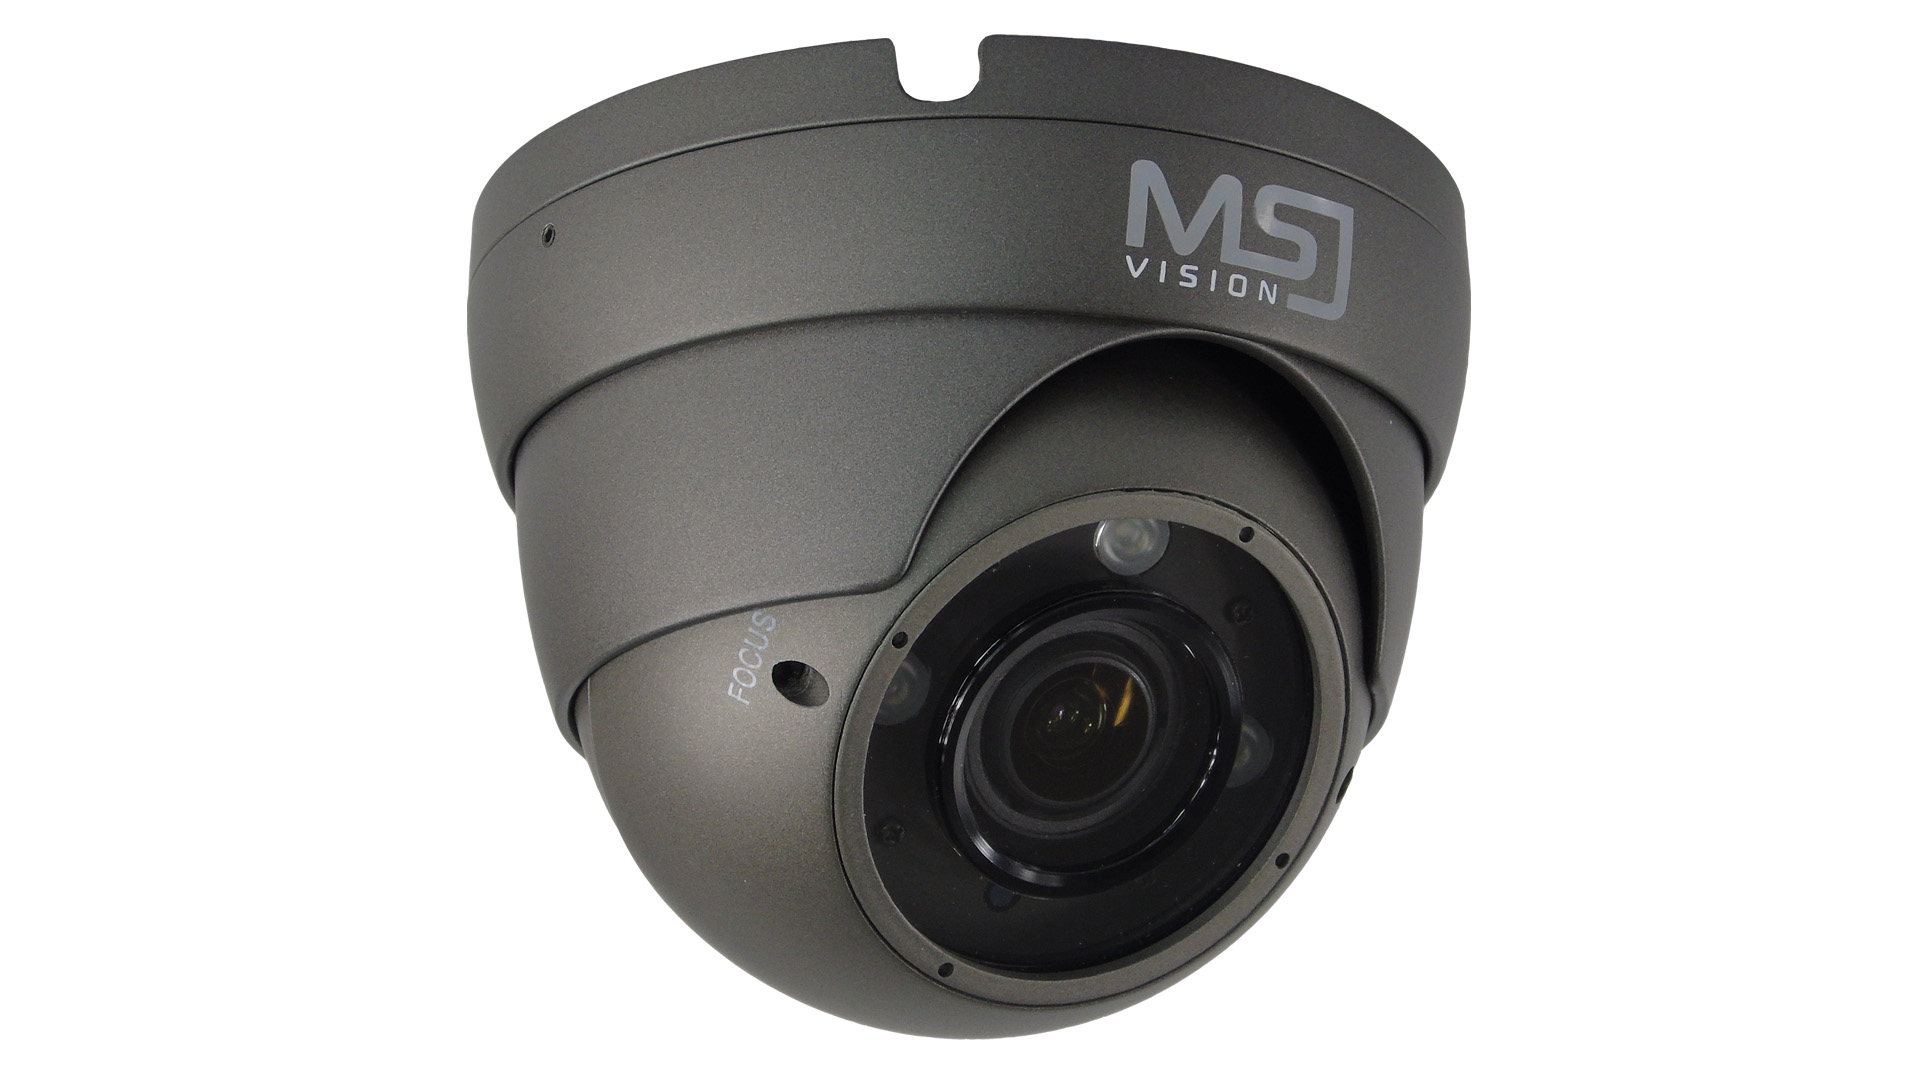 MSJ-HBR-6303G-AL1080P STARLIGHT